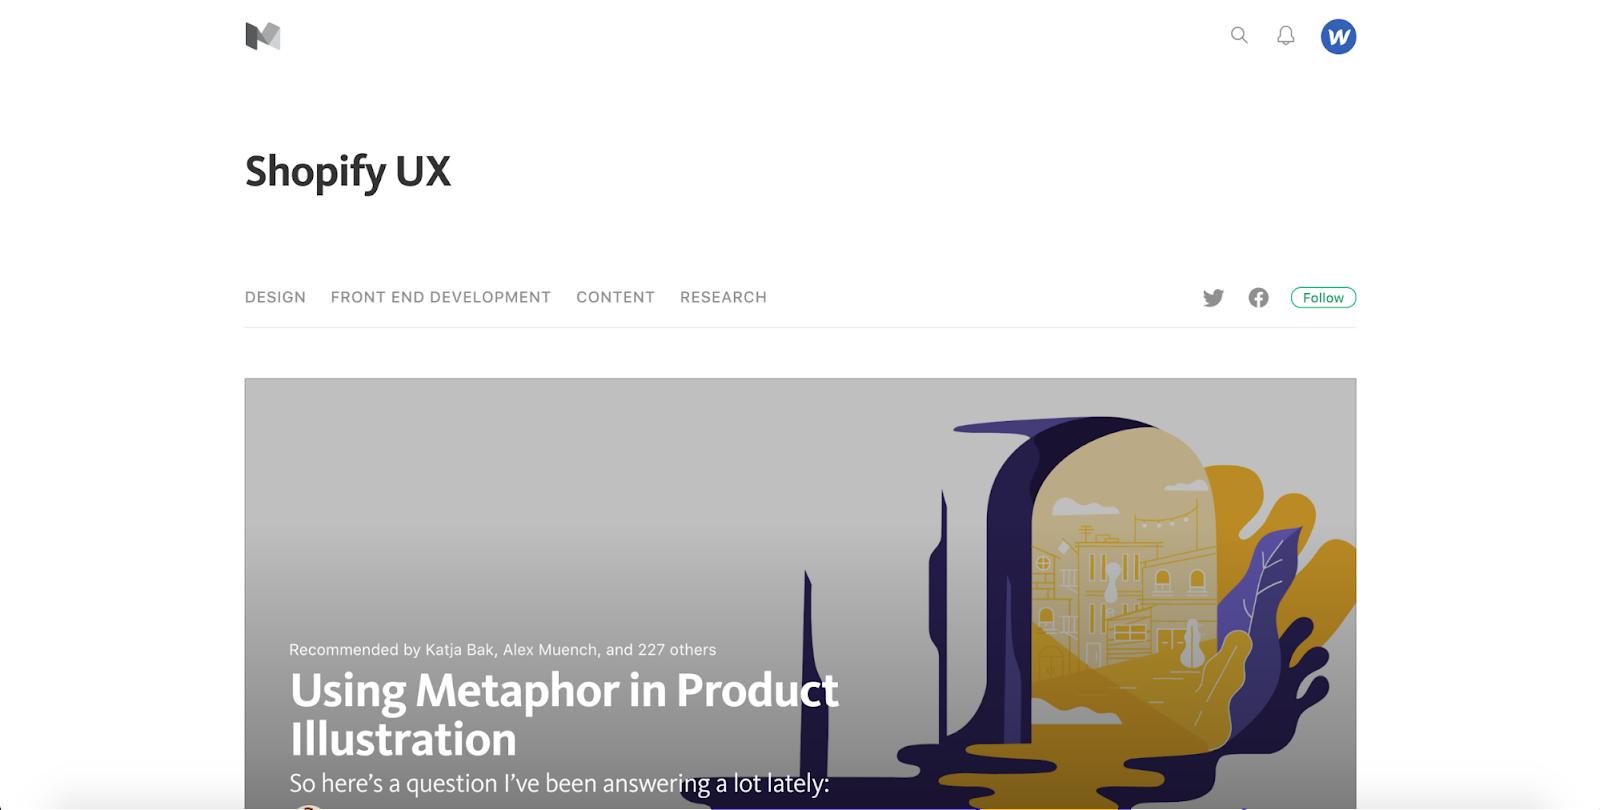 Shopify UX blog homepage